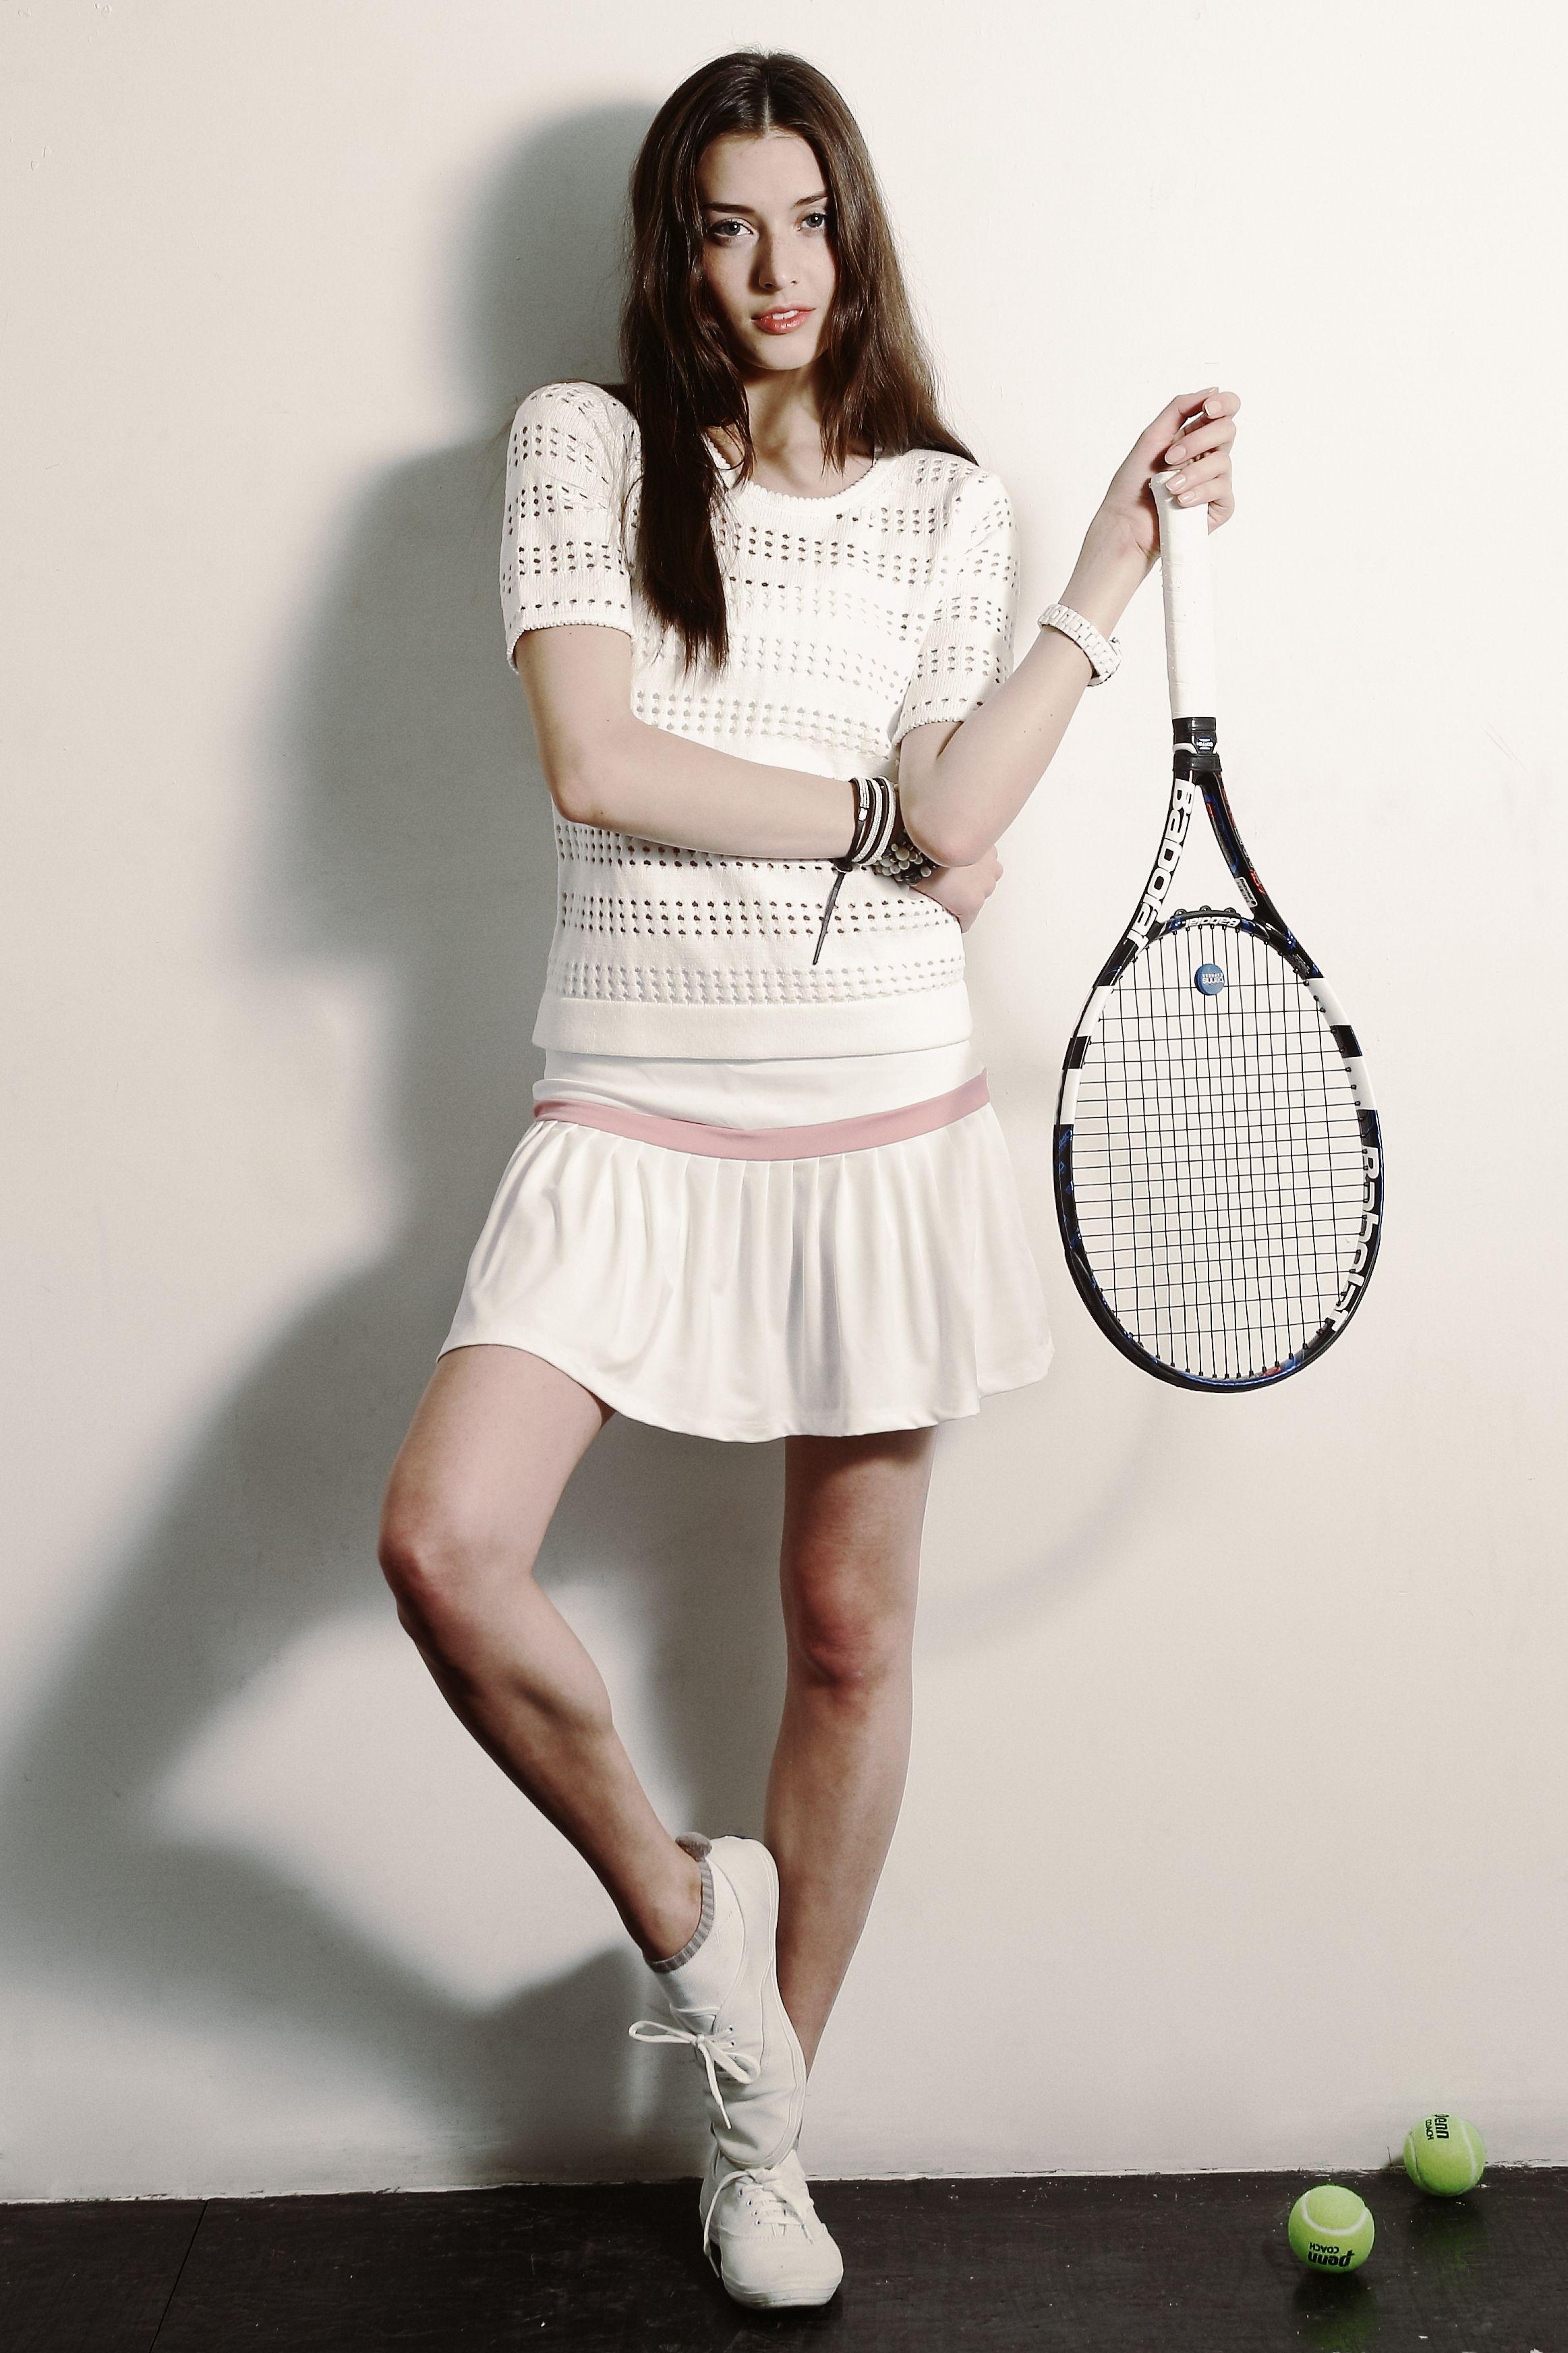 Tennis Inspired Fashion Style Glam Radar Tennis Fashion Tennis Clothes Tennis Dress